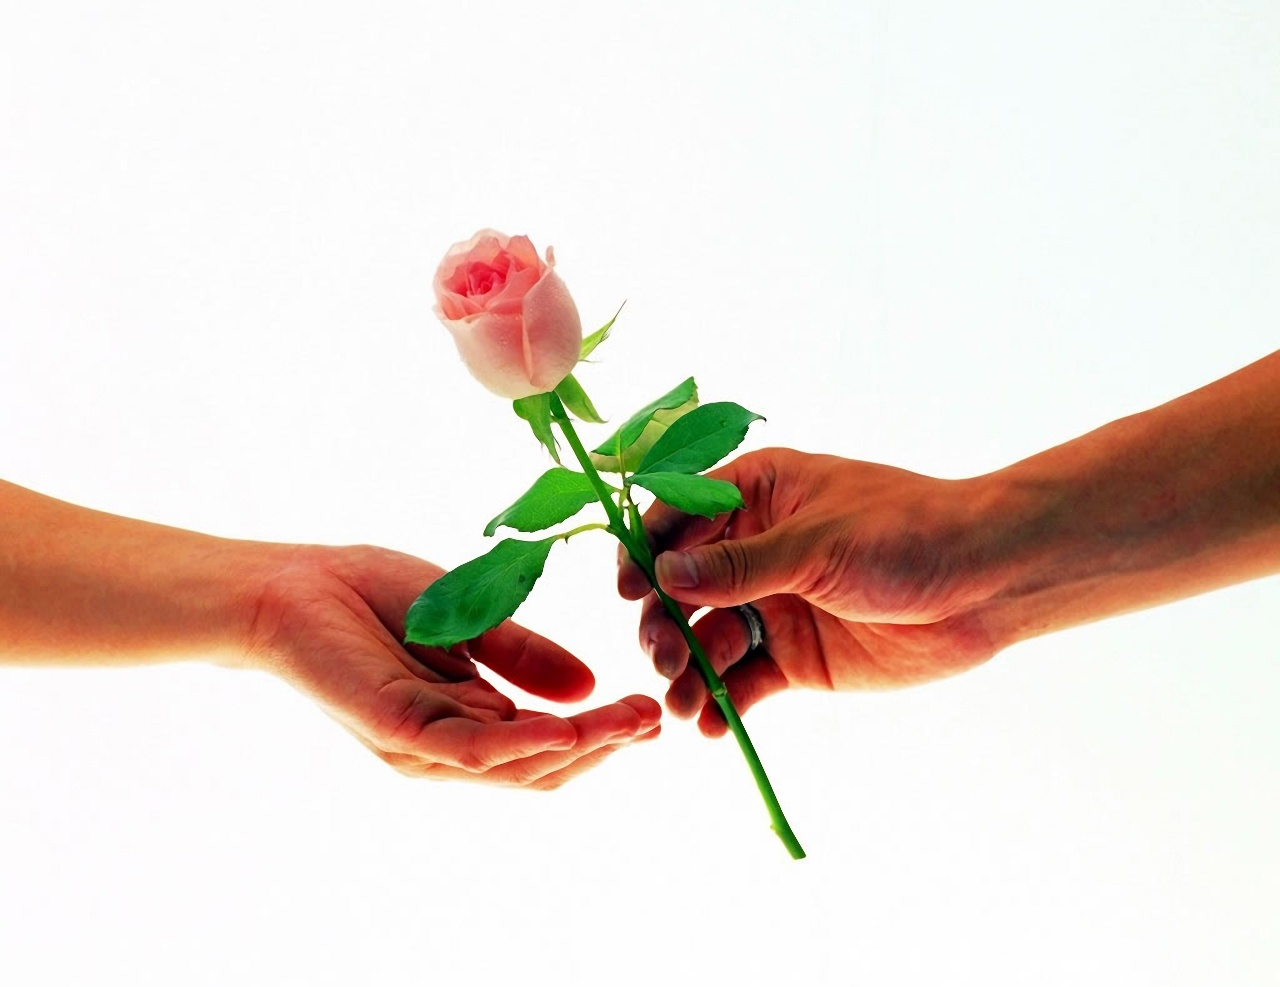 Картинки один цветок в руке